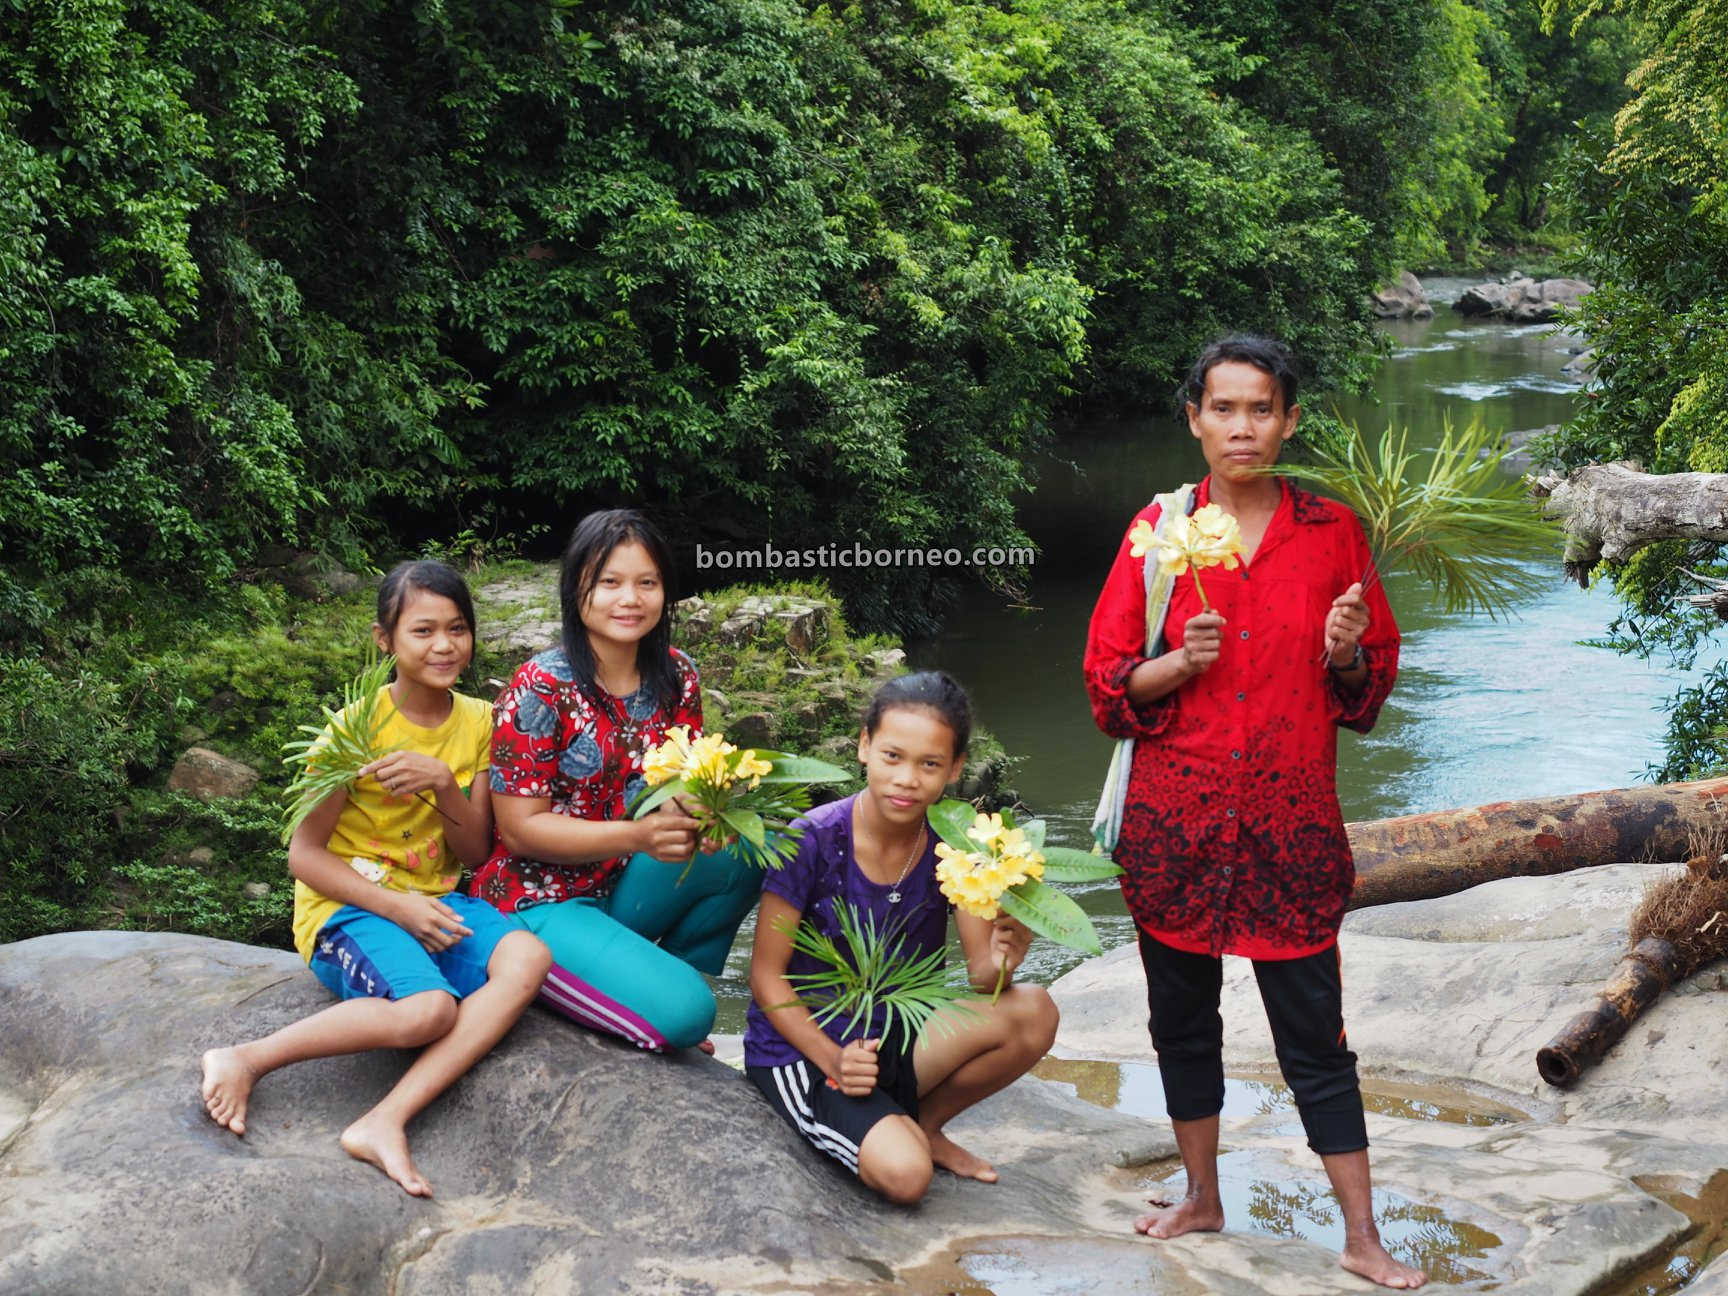 Air Terjun, adventure, nature, outdoor, exploration, Bengkayang, Desa Bengkawan, Seluas, Obyek Wisata, Tourism, native, village, Borneo, 印尼原住民部落, 西加里曼丹瀑布,